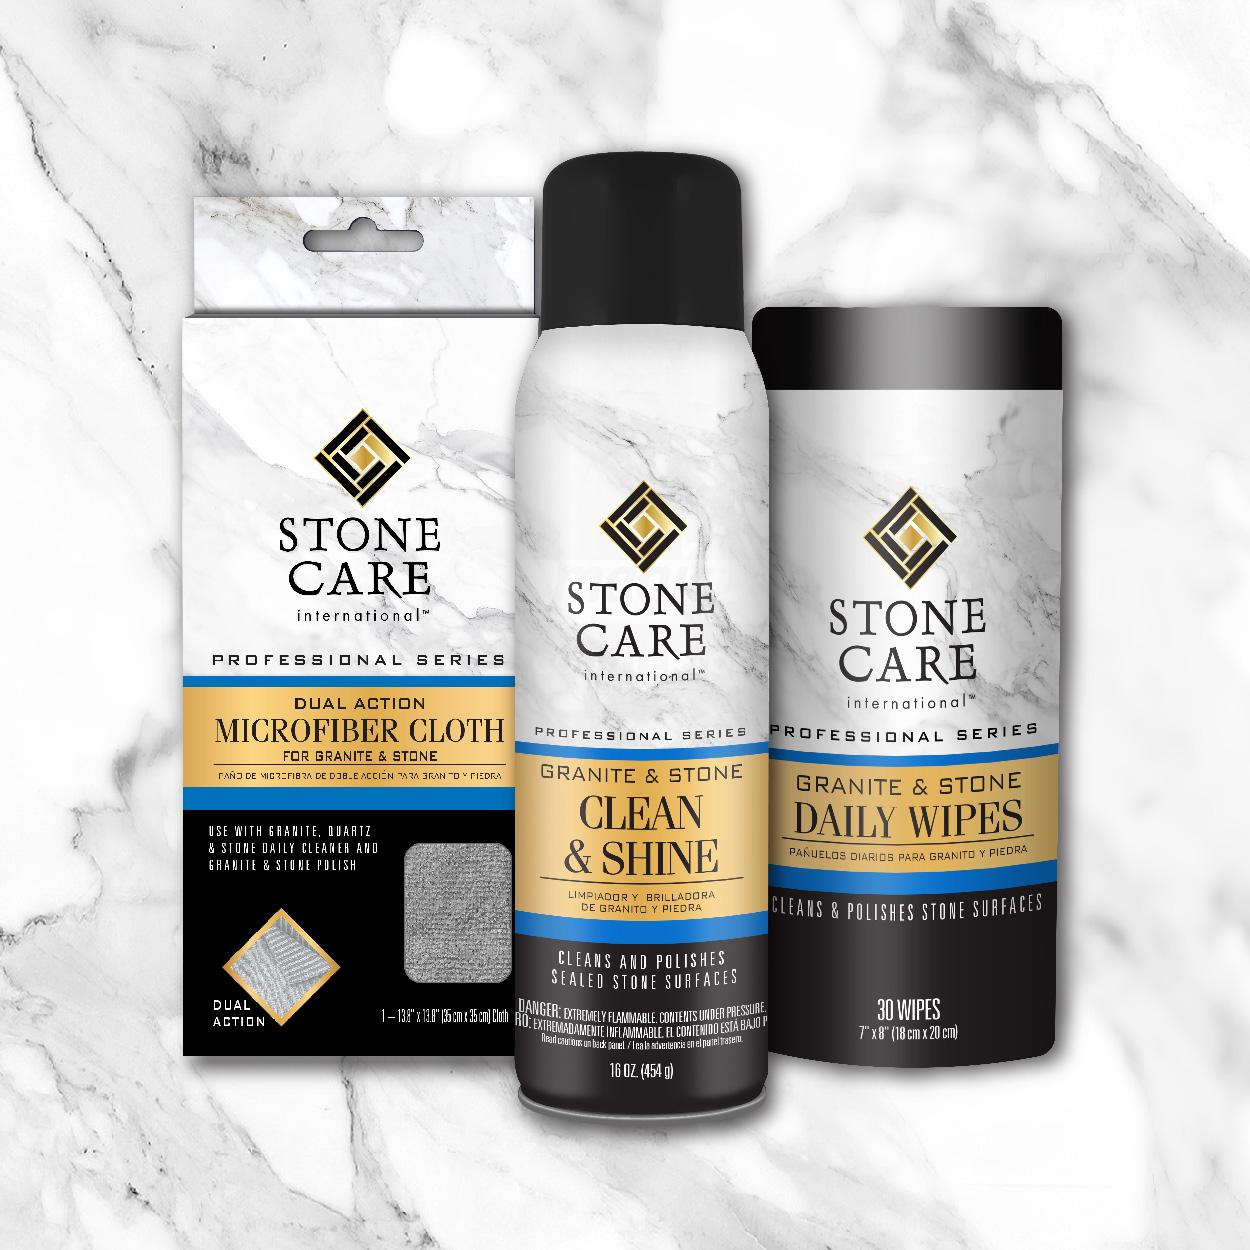 Stone care international granite stone daily wipes 30 count home kitchen - Stone international ...